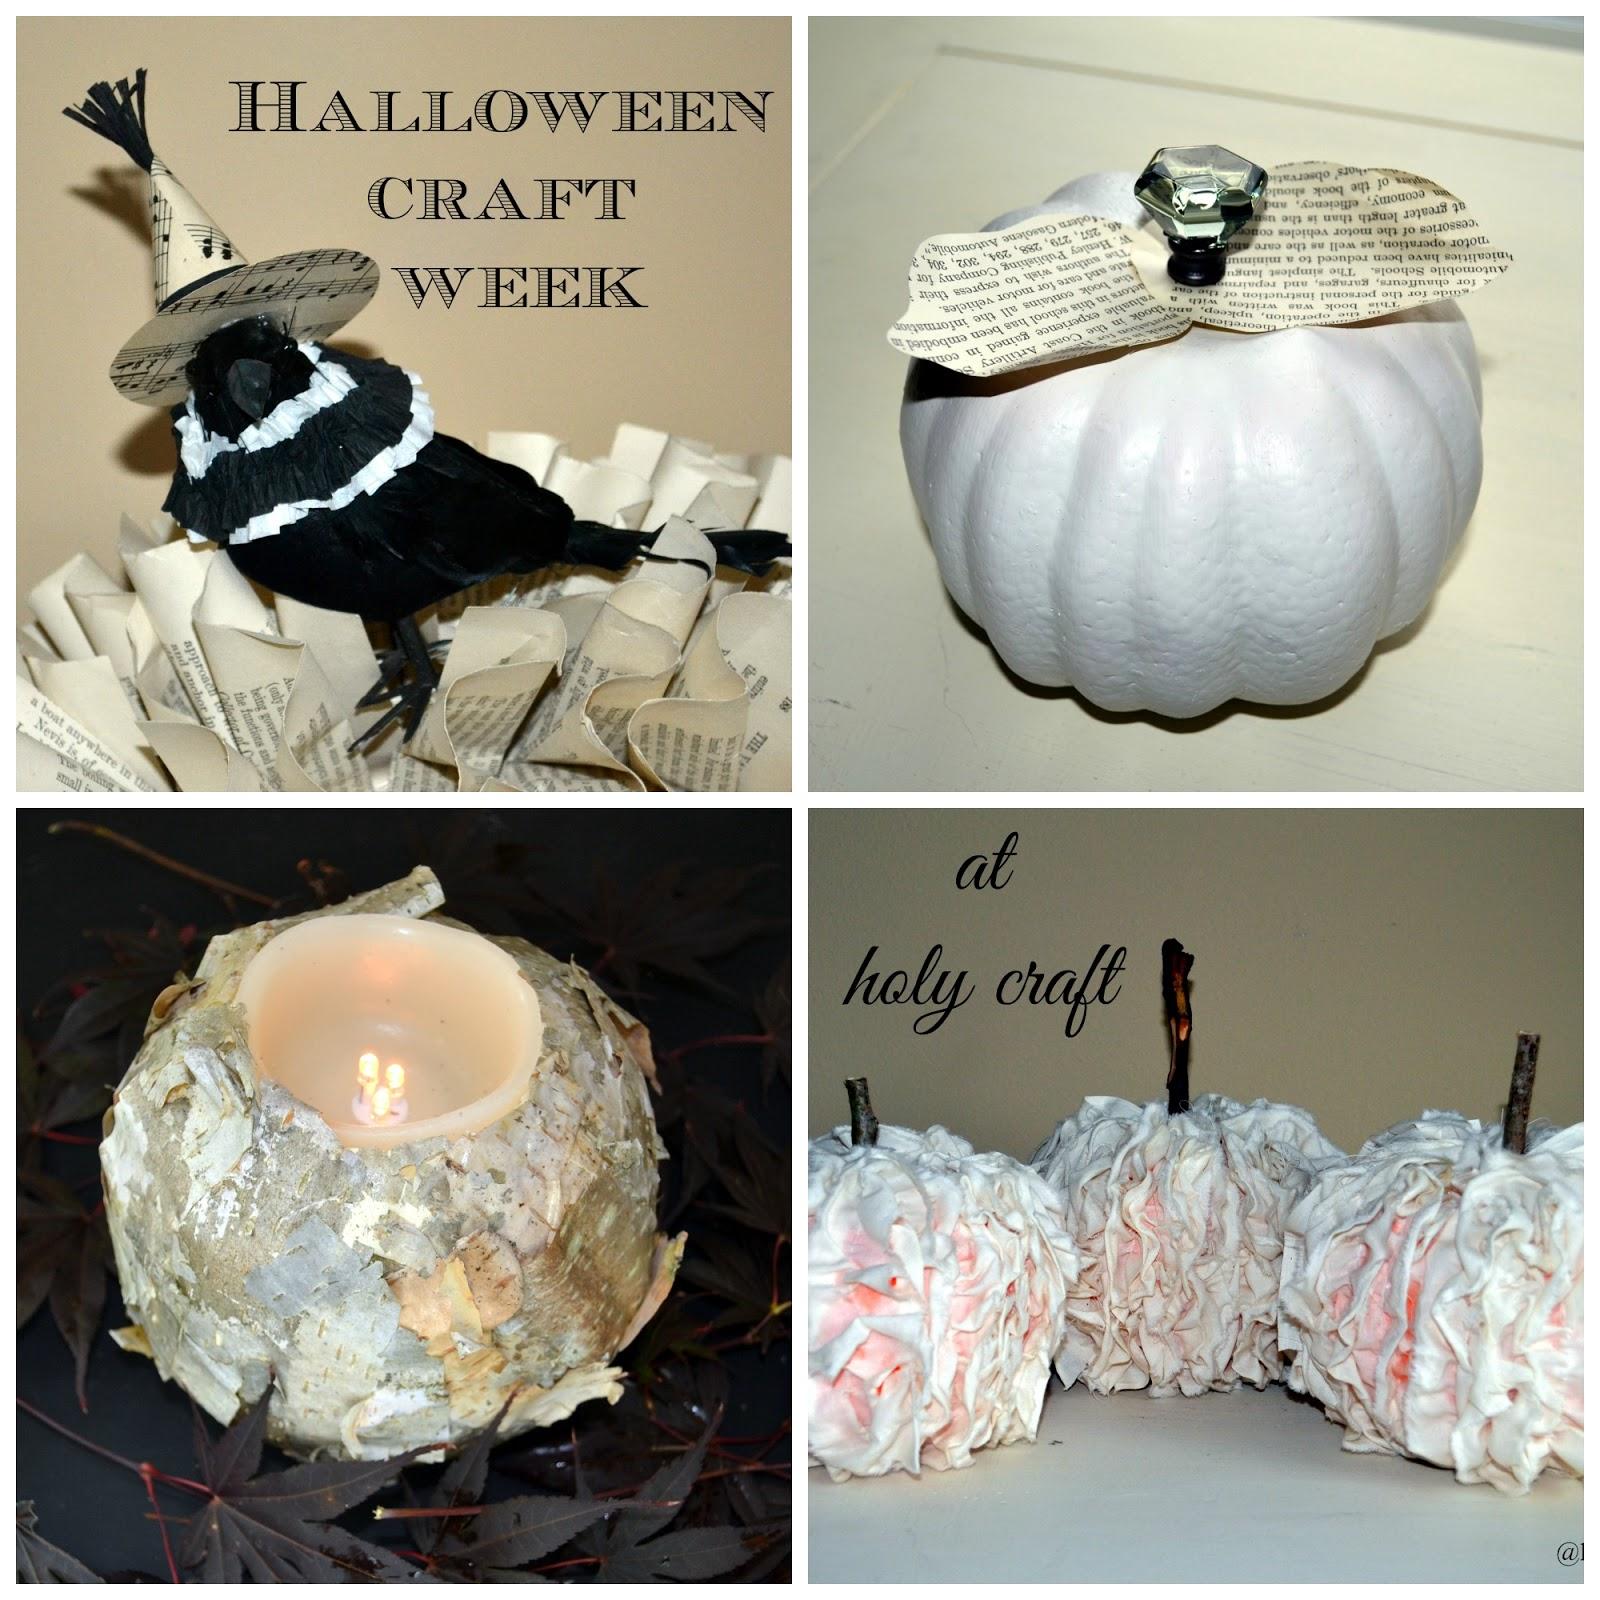 http://3.bp.blogspot.com/-gNTPOGo6axE/VCxKDAYhifI/AAAAAAAAcjY/kfuGwPWmPjw/s1600/halloween%2Bweek.jpg